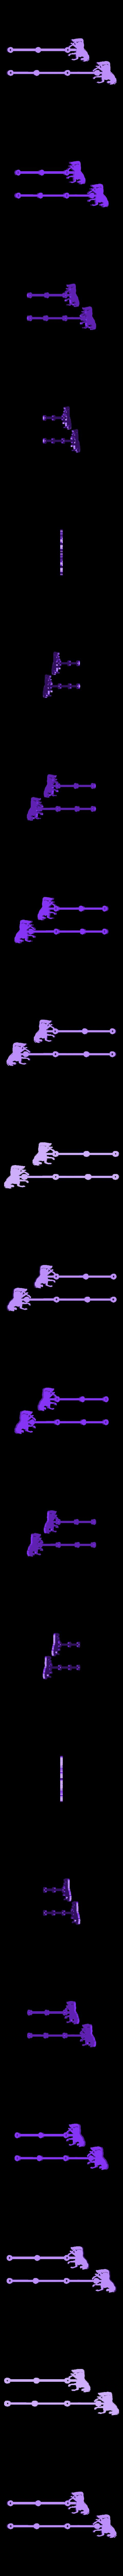 touilleur chevaux.stl Download STL file drink cocktail • 3D print template, catf3d